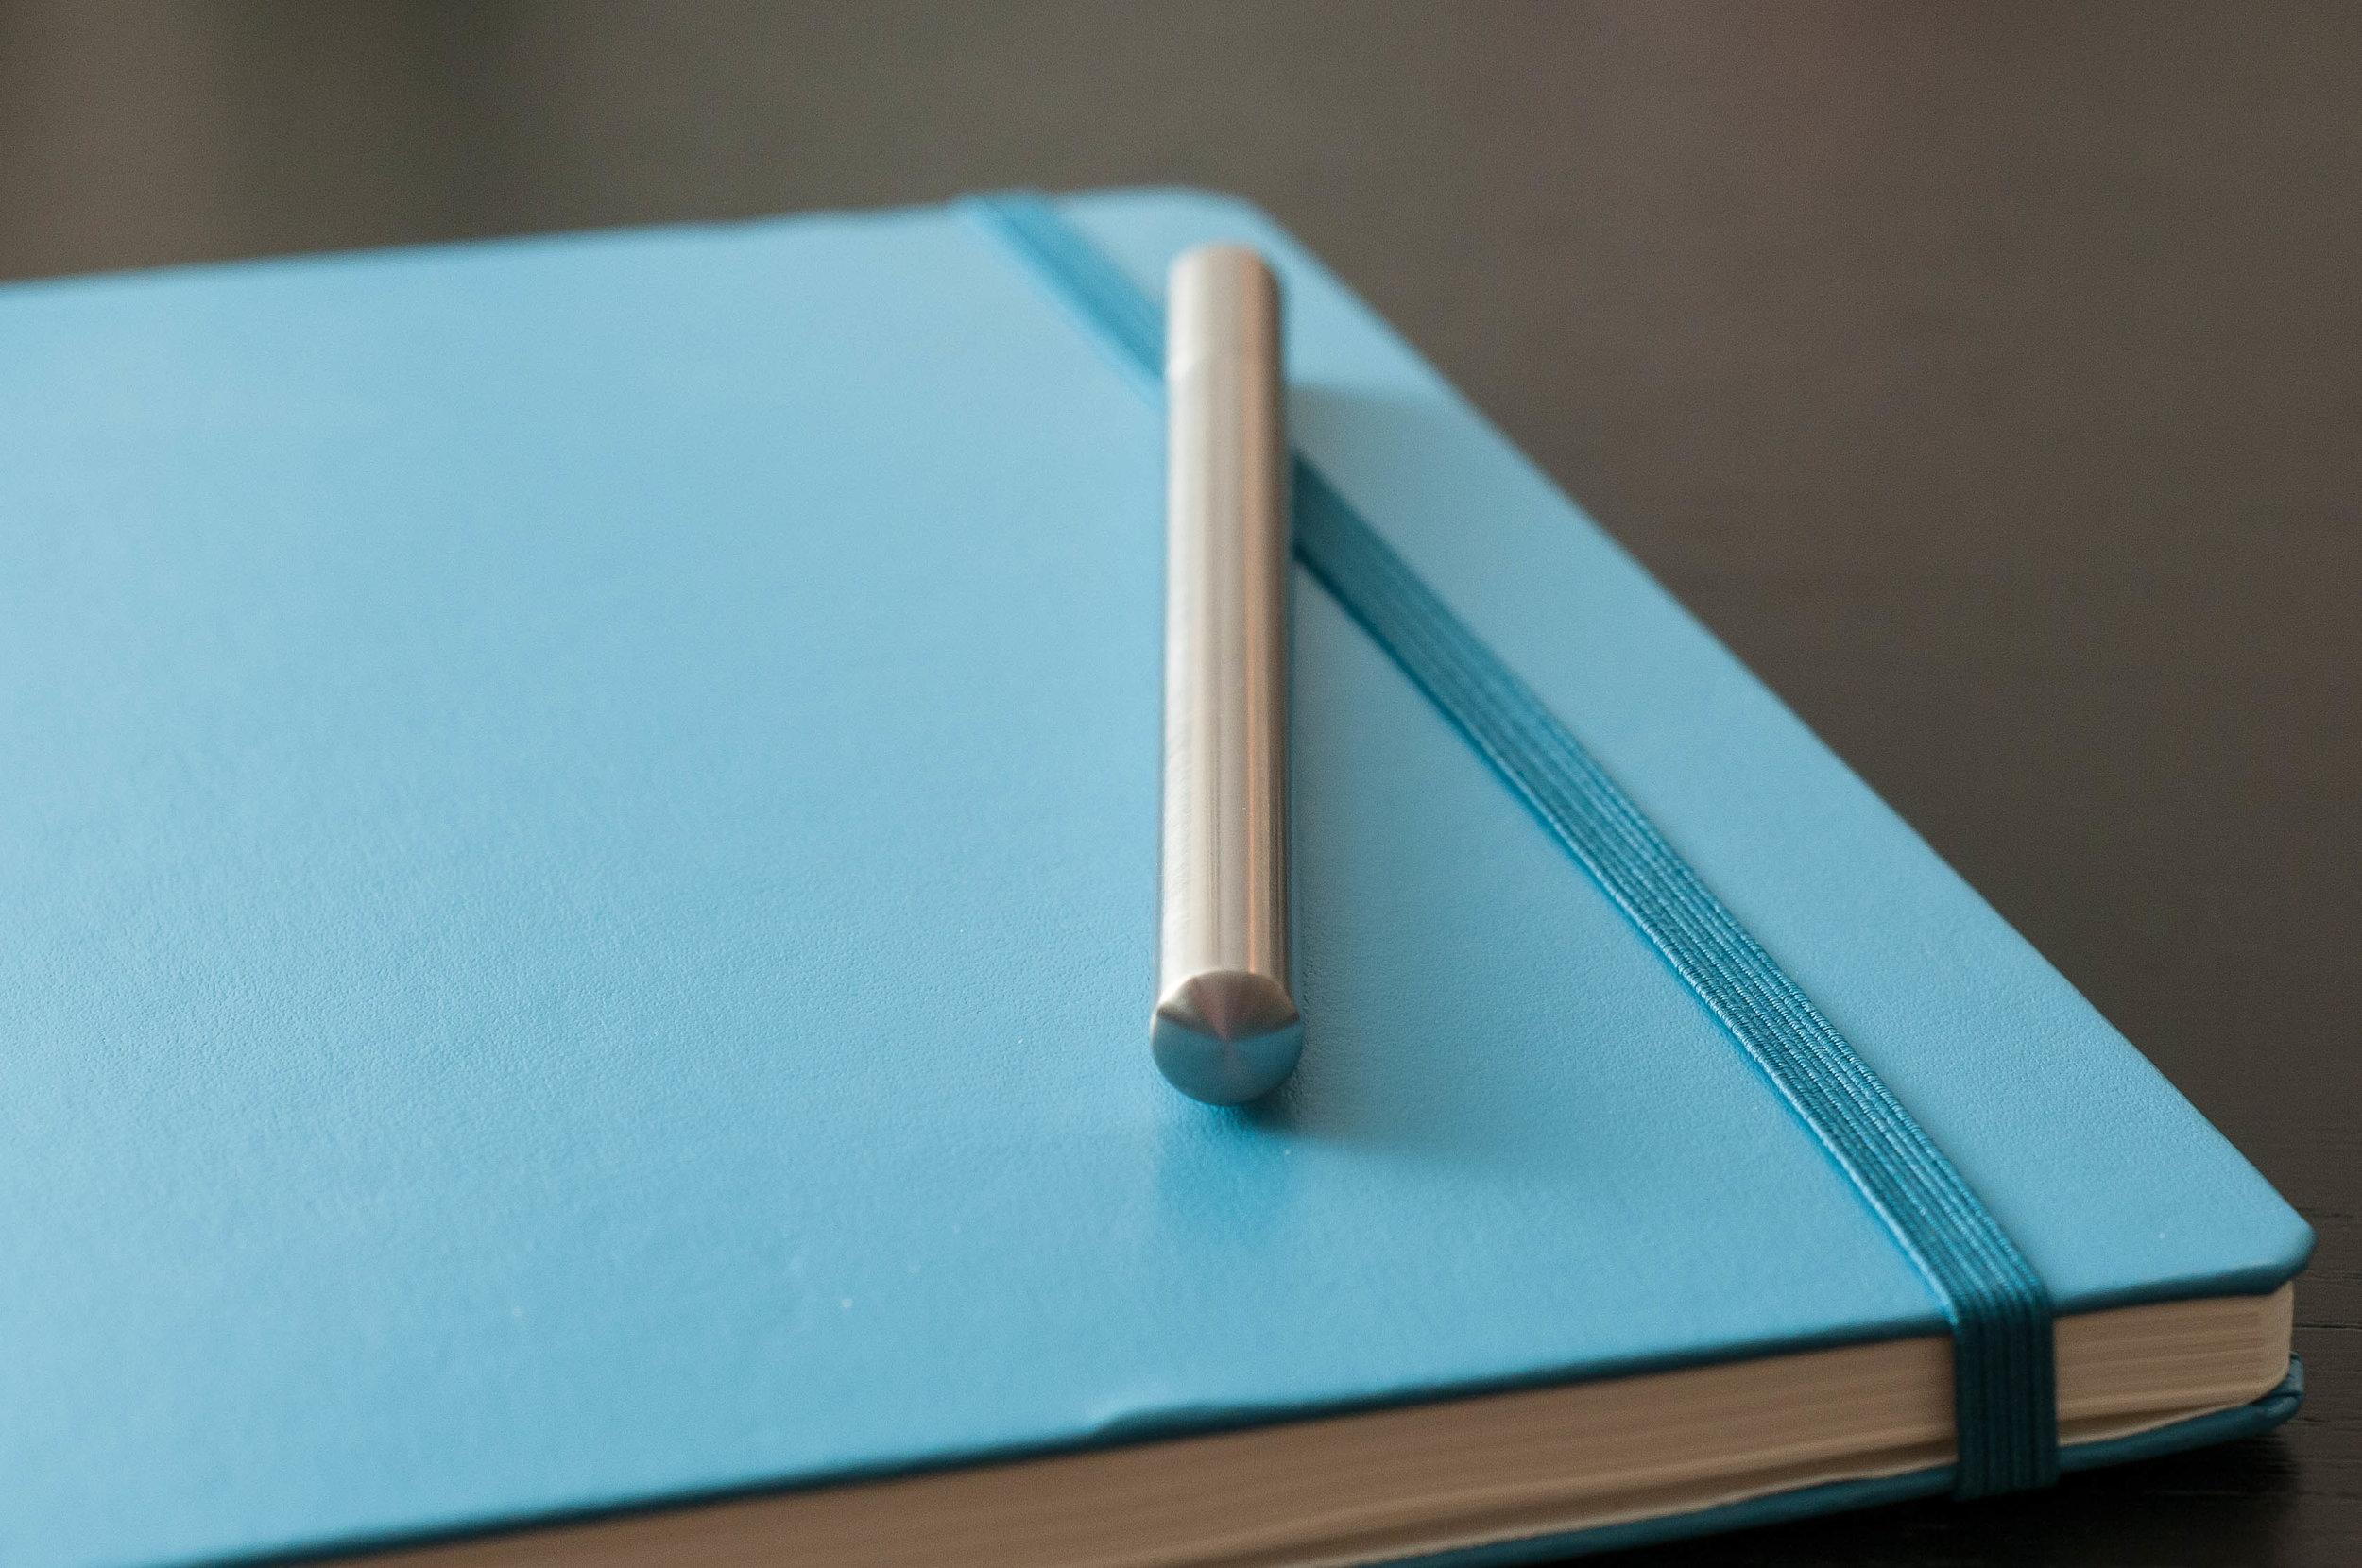 ATELEIA Stainless Steel Pen Review